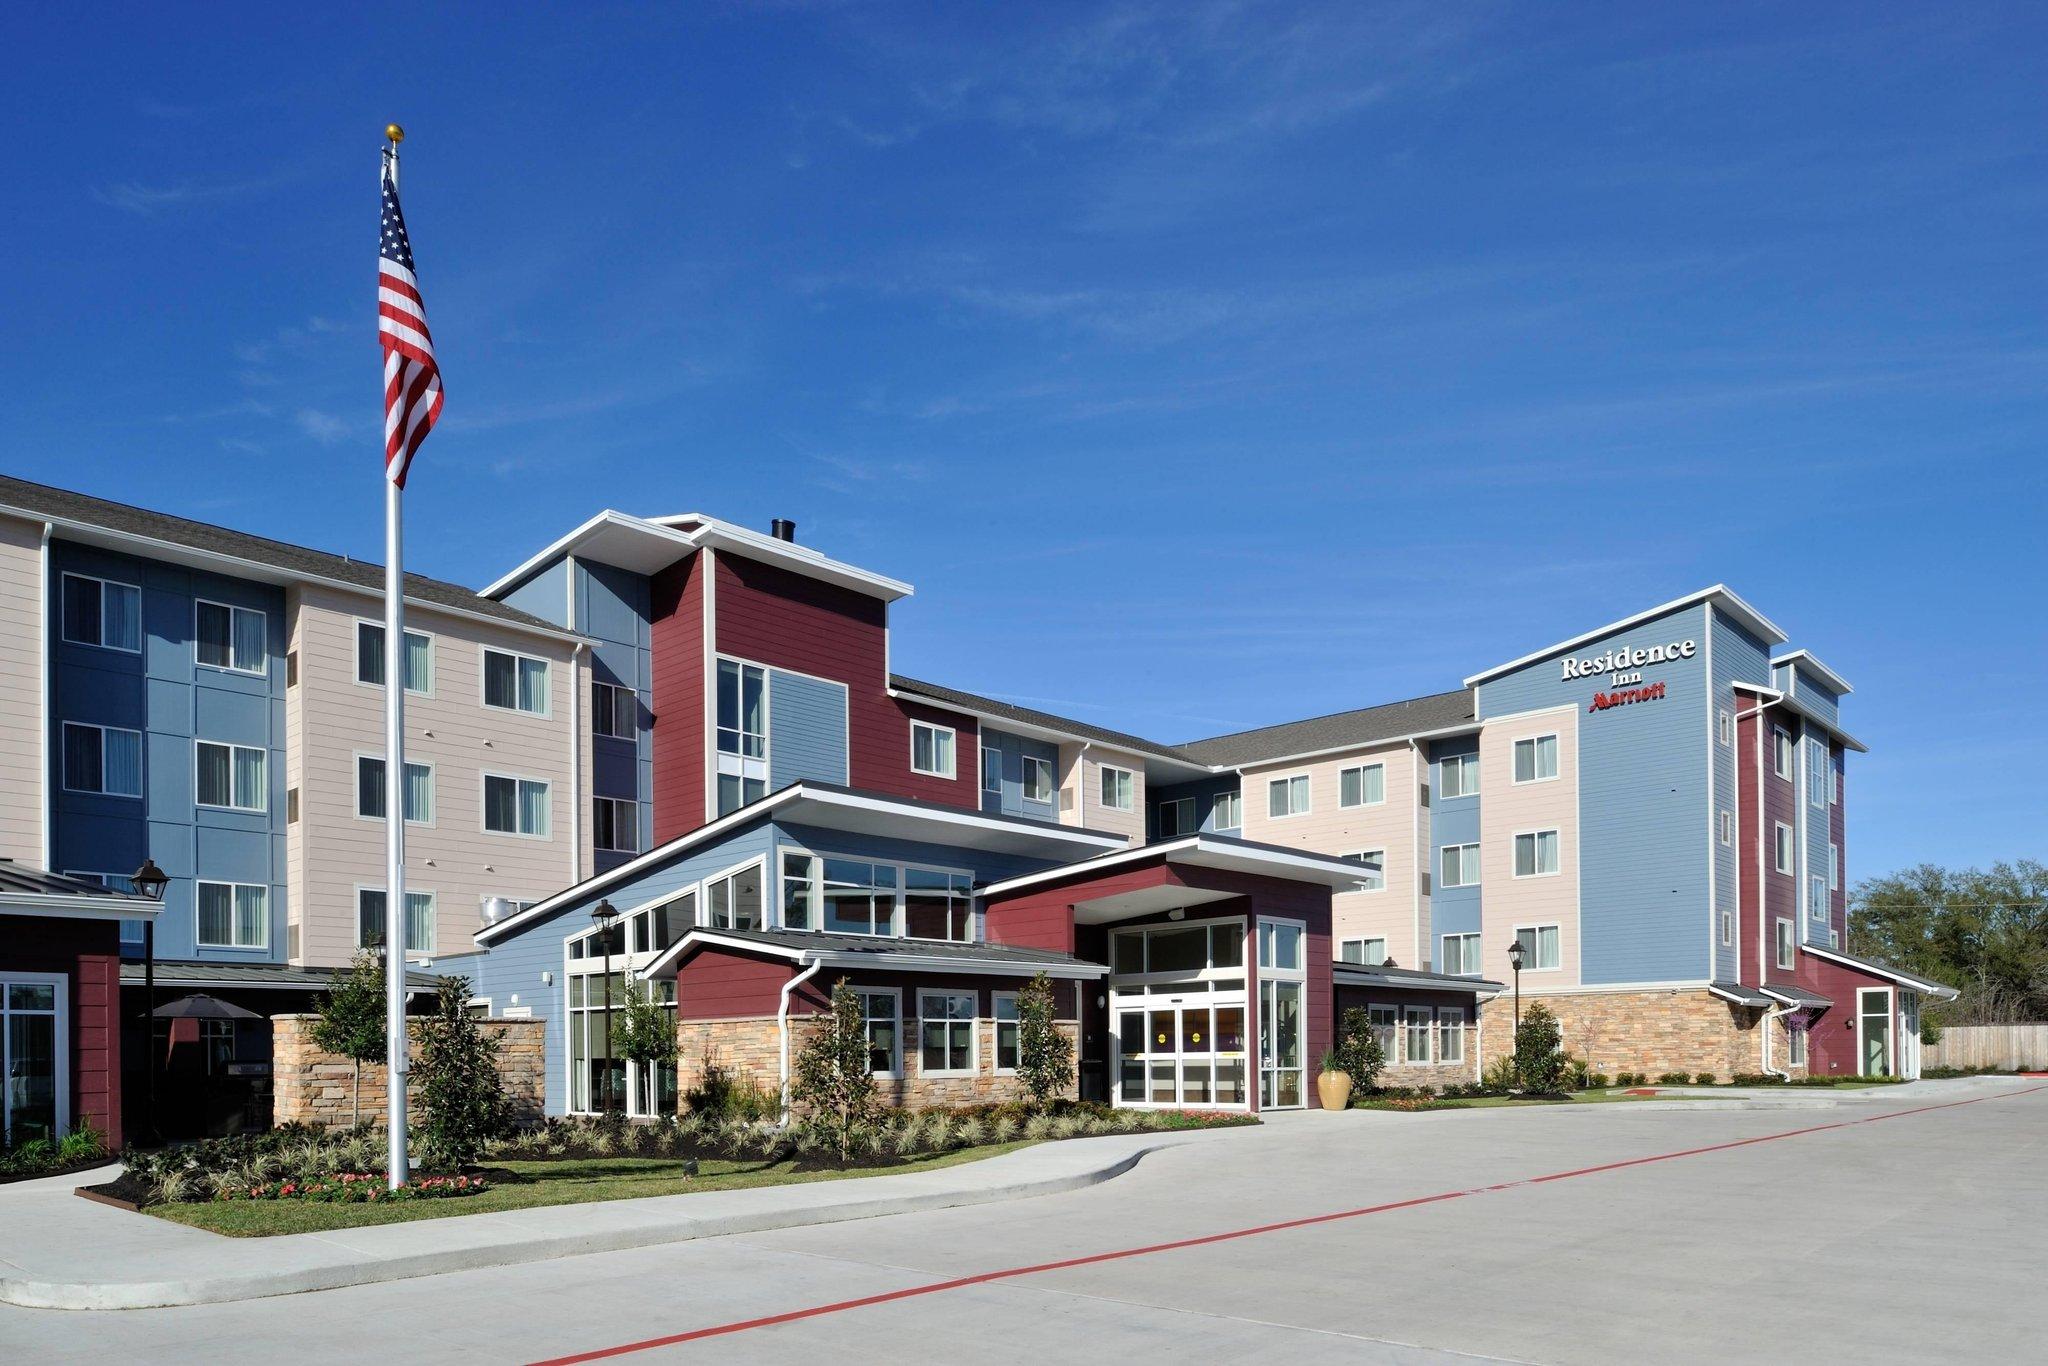 Residence Inn by Marriott Houston Northwest-Cypress